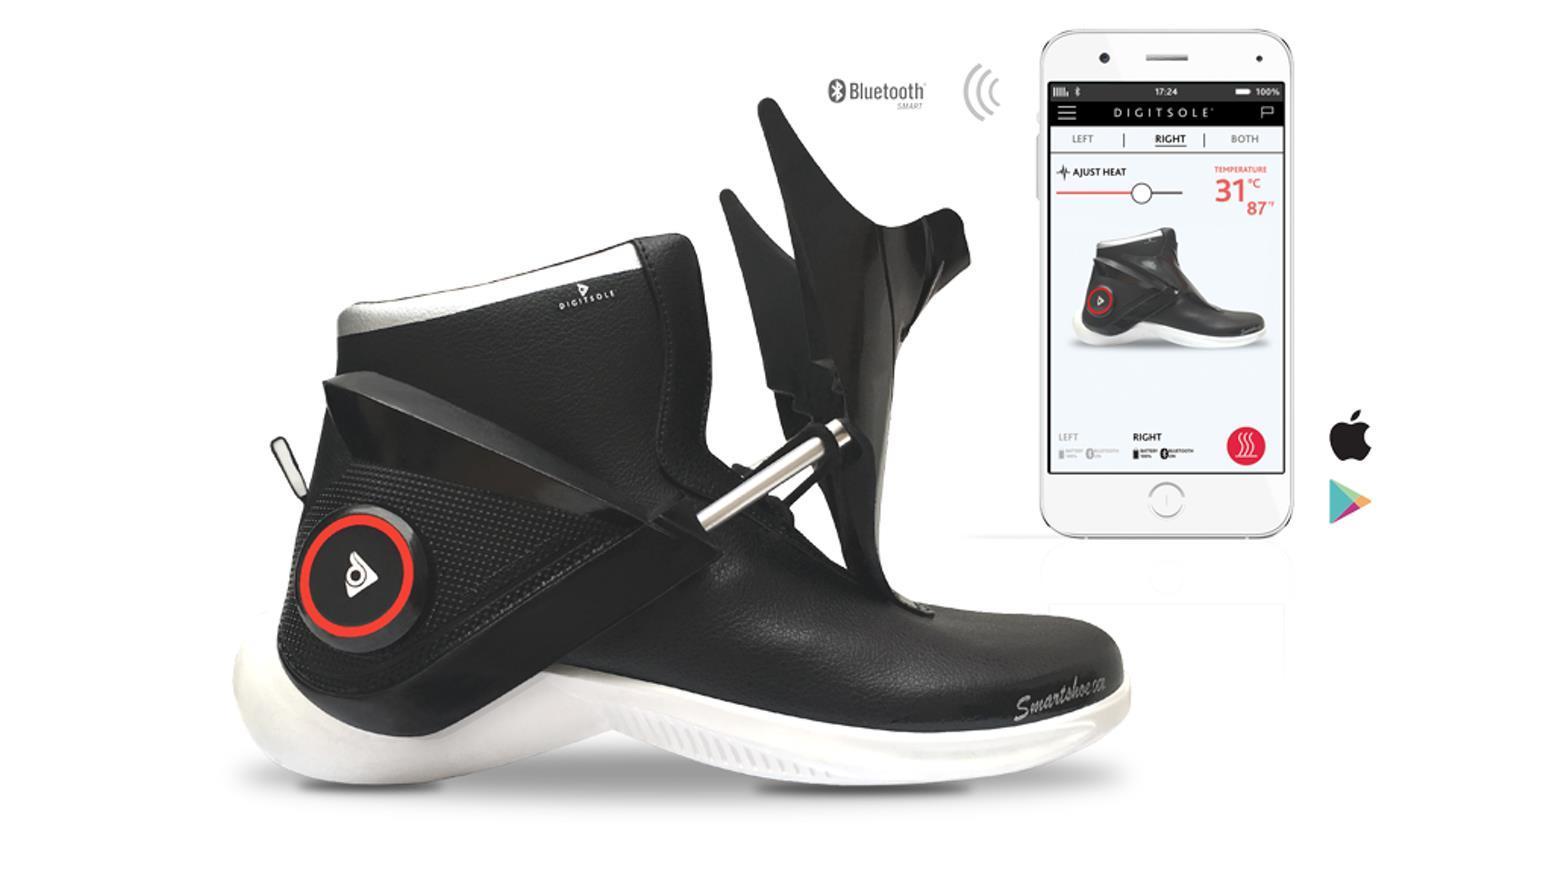 Digitsole Smartshoe 智慧避震鞋